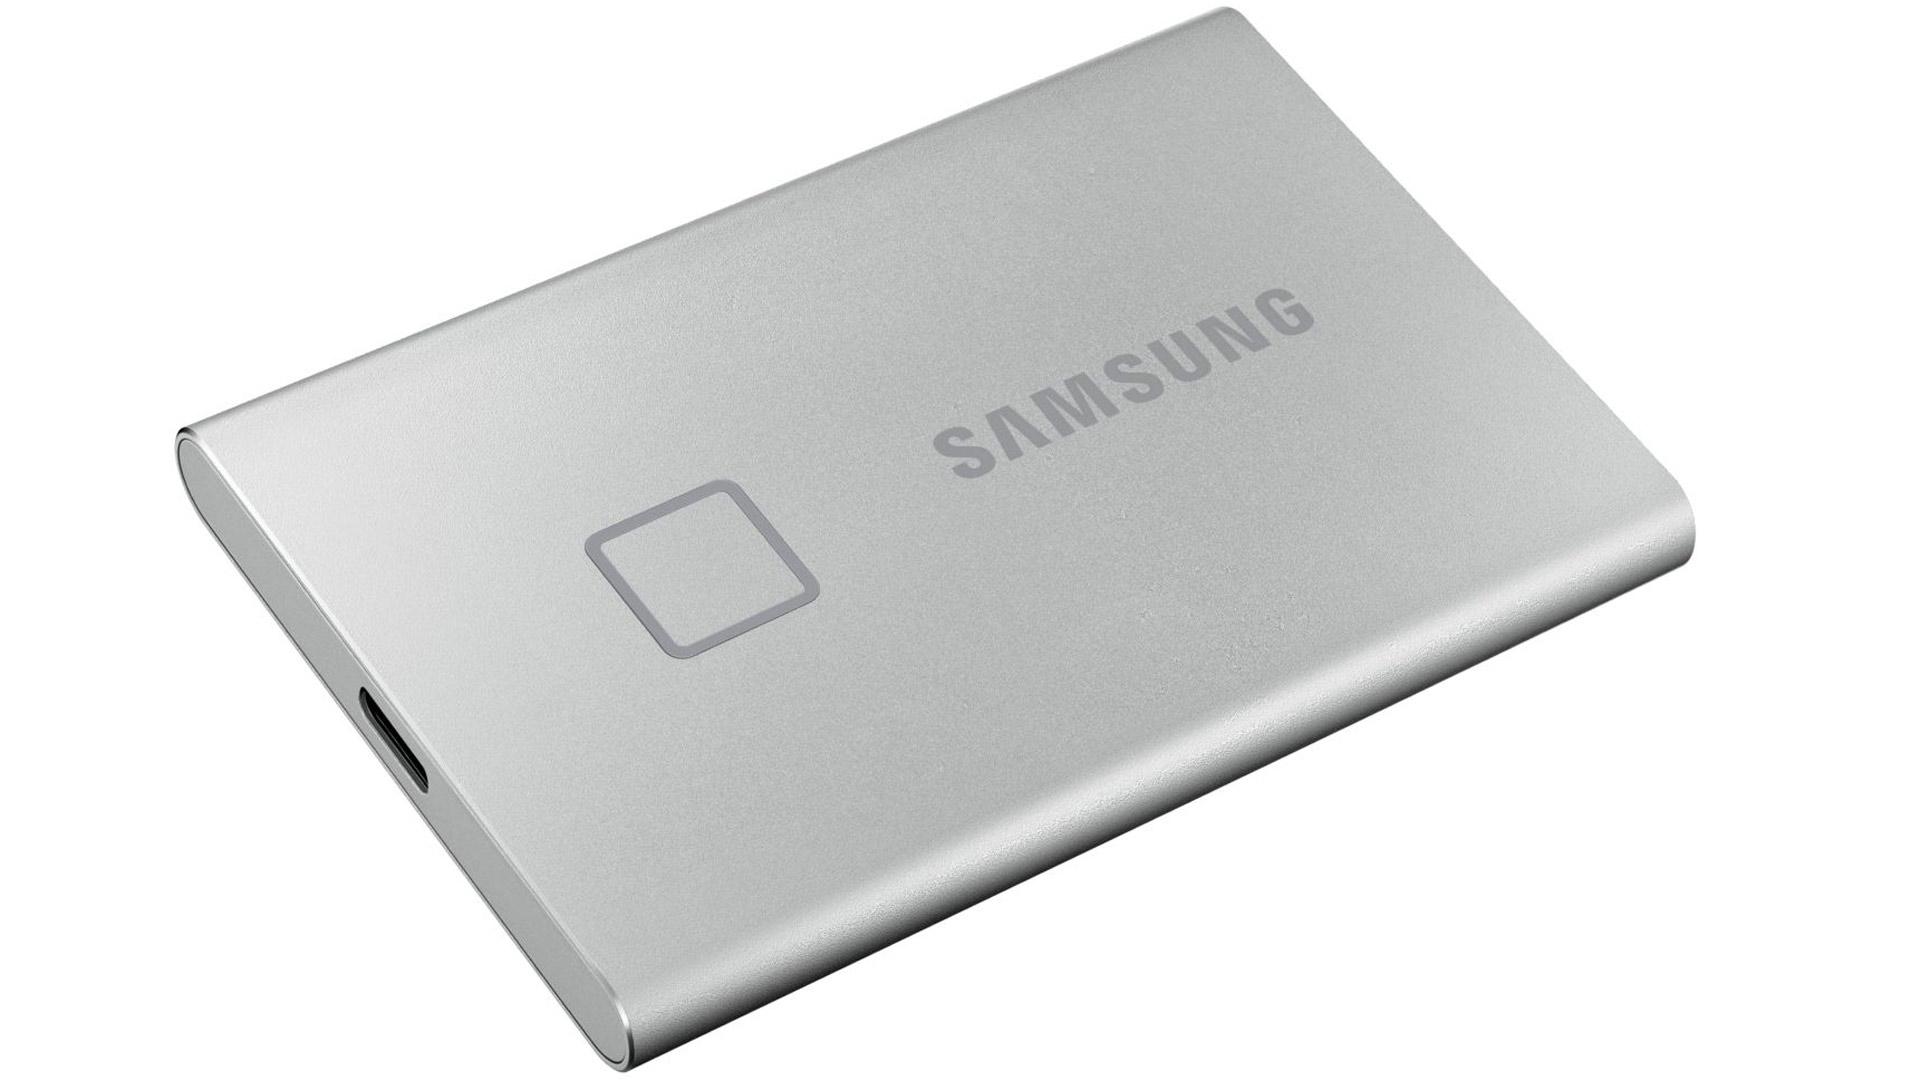 Samsung T7 Touch 1TB -usb-muisti maksaa 270 euroa.